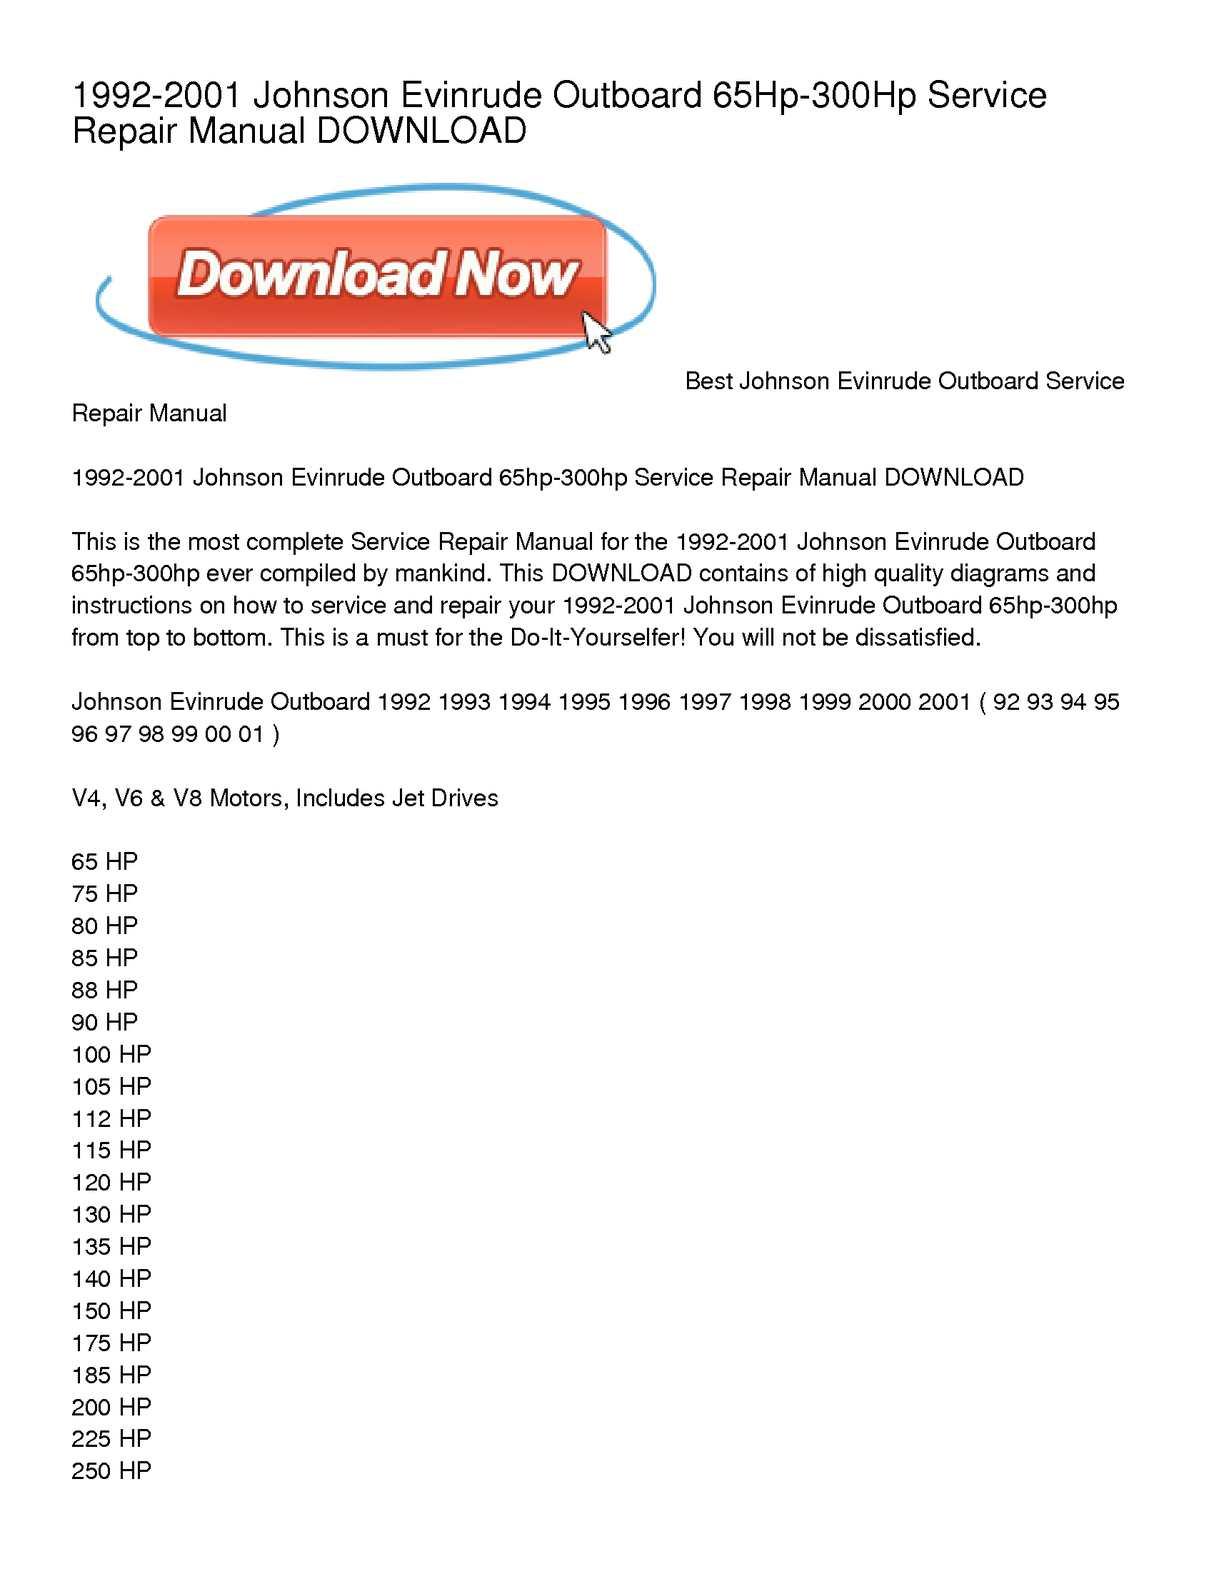 johnson evinrude outboard service manual Array - johnson outboard motor repair  manuals newmotorku co rh newmotorku co